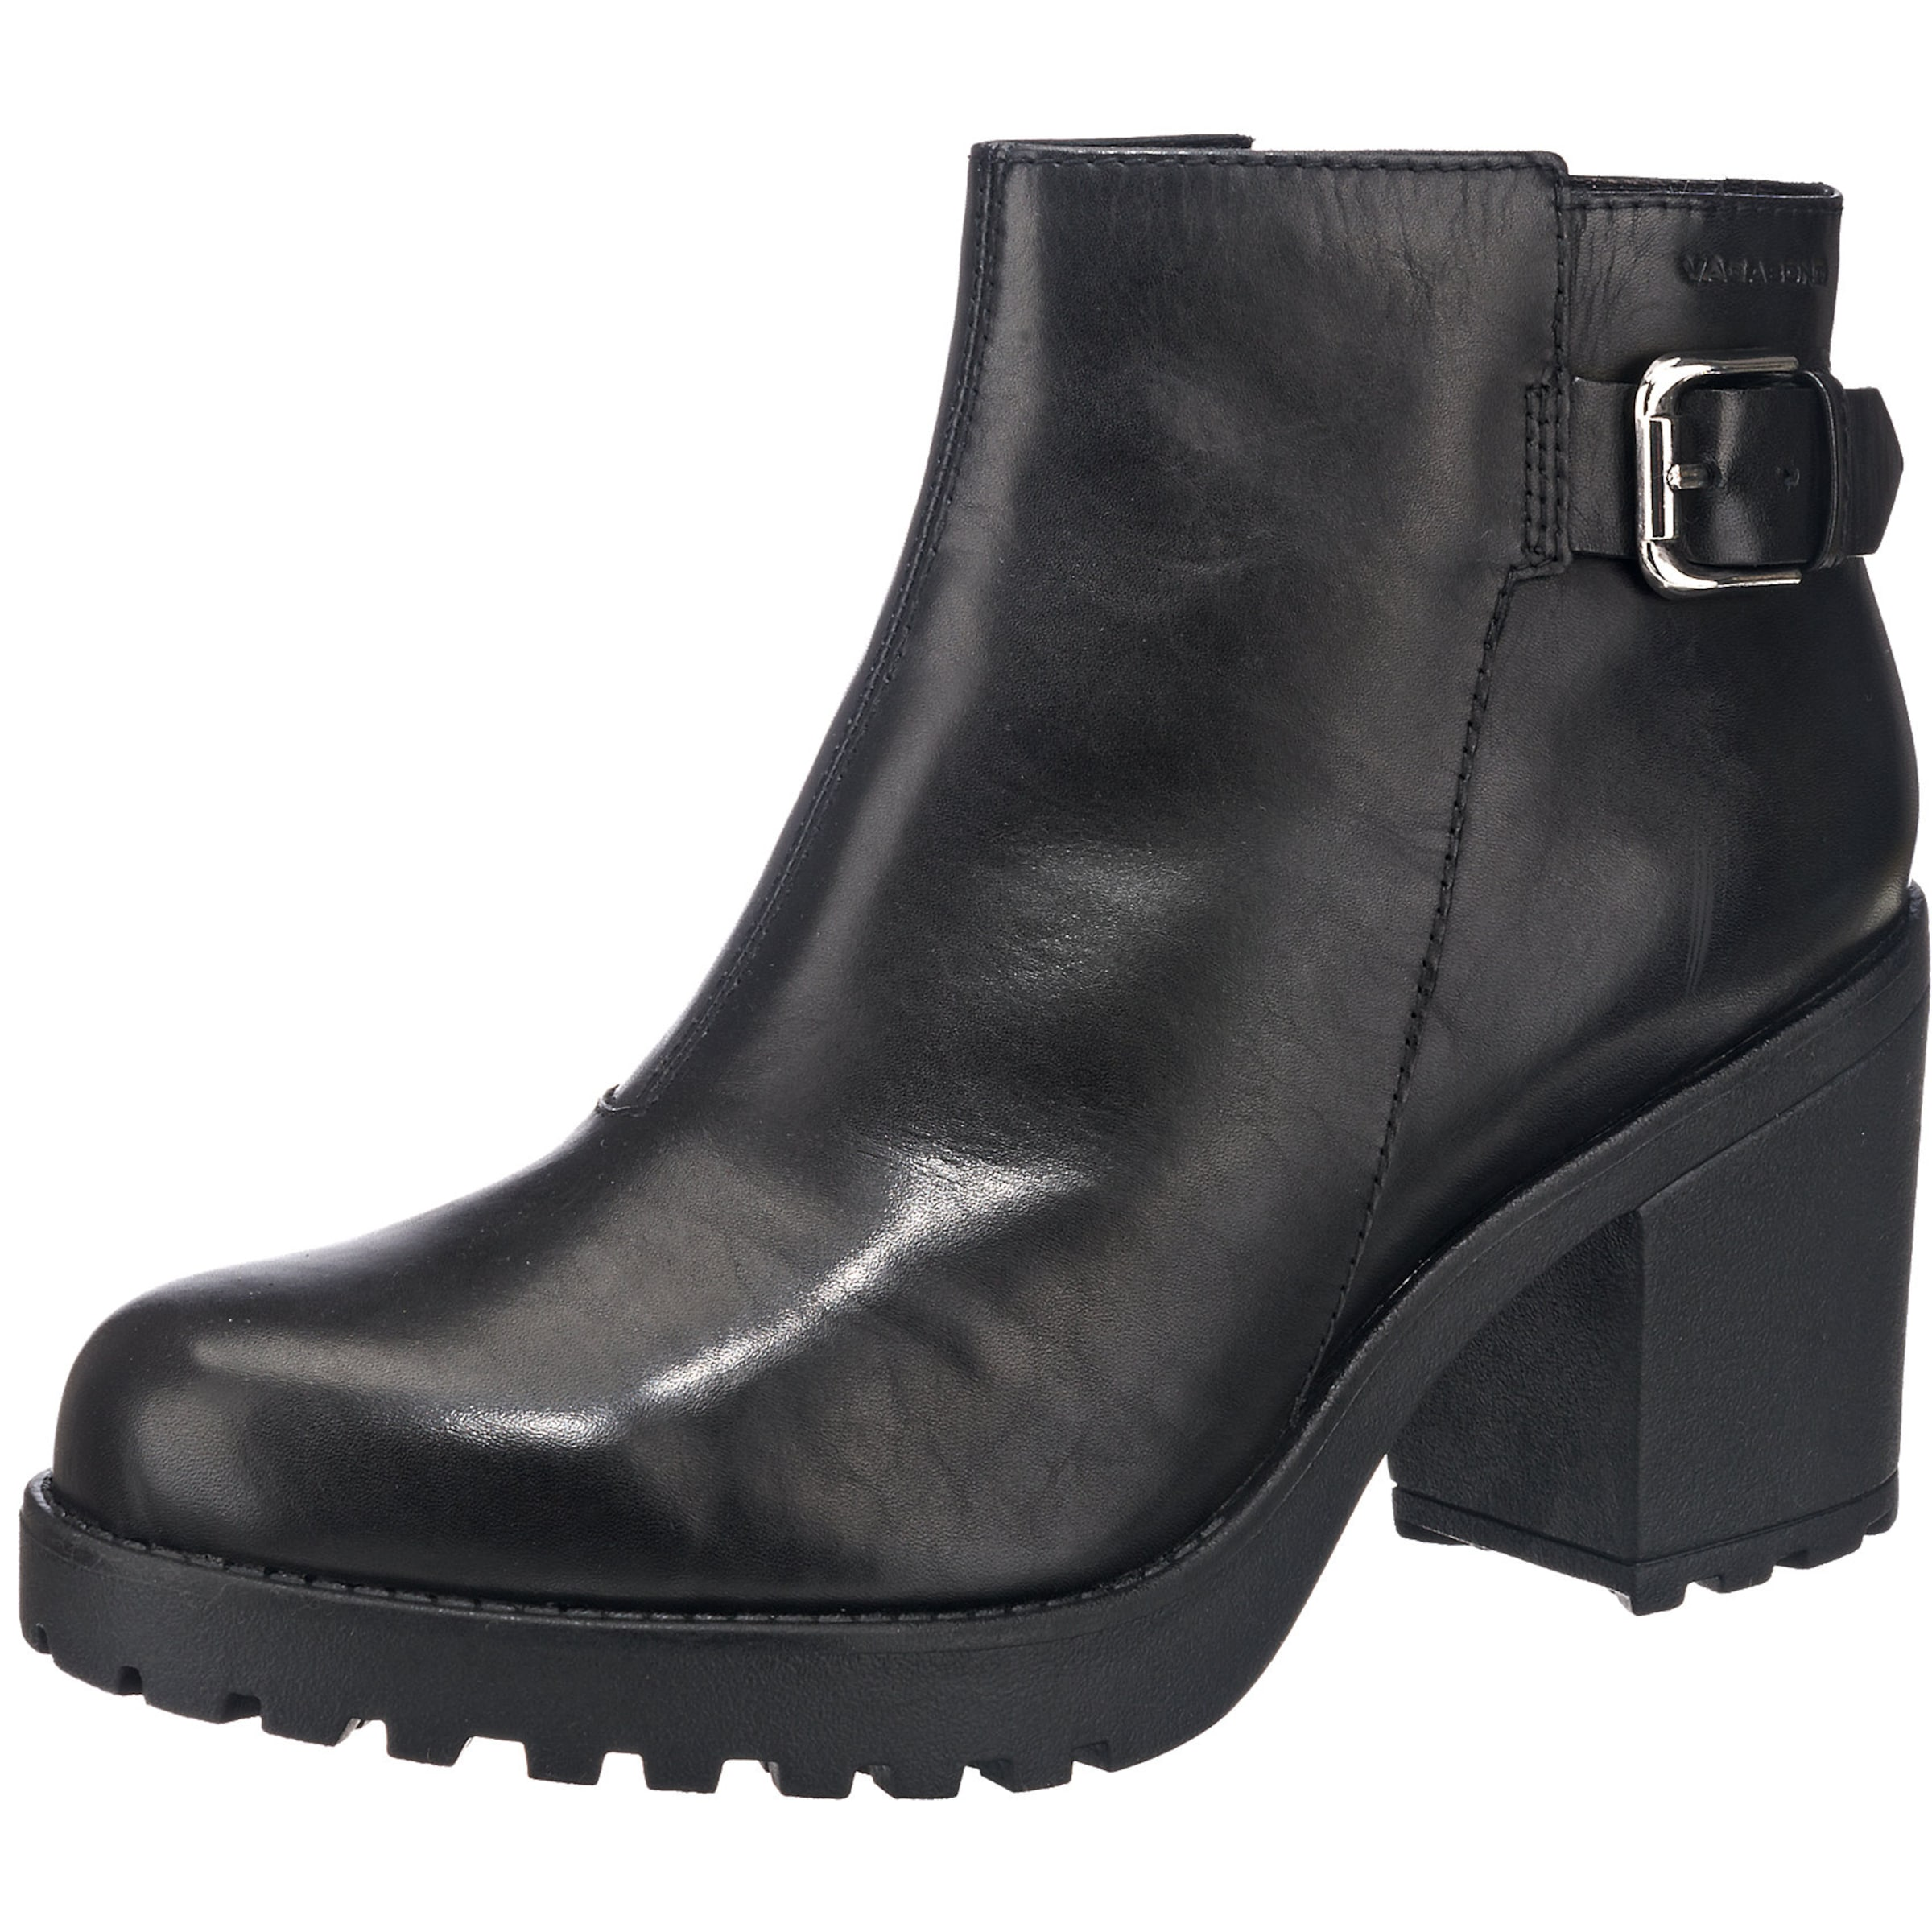 VAGABOND VAGABOND VAGABOND SHOEMAKERS Grace Stiefeletten Günstige und langlebige Schuhe aa6a4b